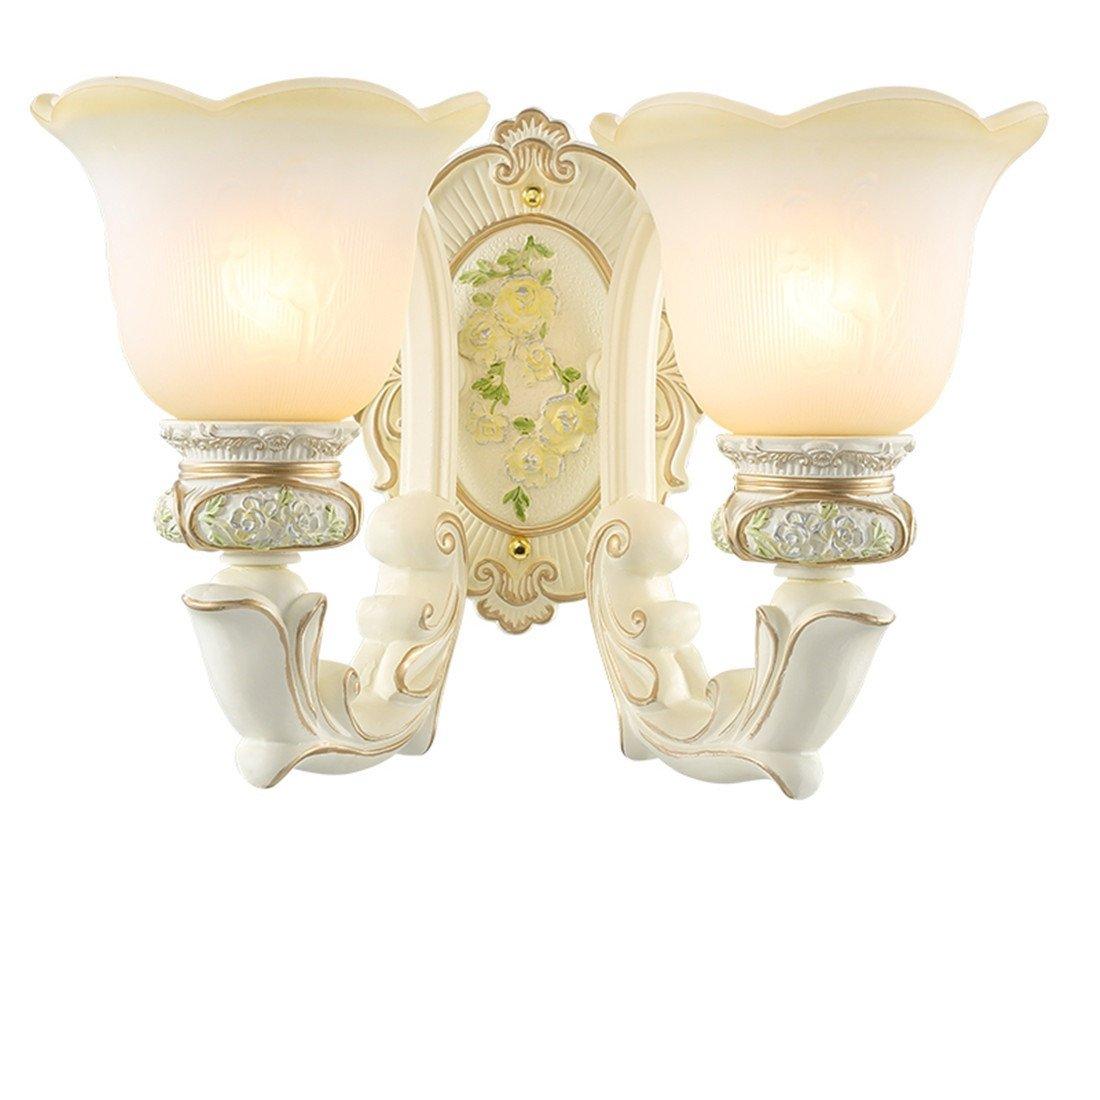 MMYNL  Wandleuchte Schlafzimmer Wand Lampe Nachttischlampe Wohnzimmer Lampe Wandleuchte Treppe Lampe Gang Lampe E 27,2 Kopf, W36H 27 cm